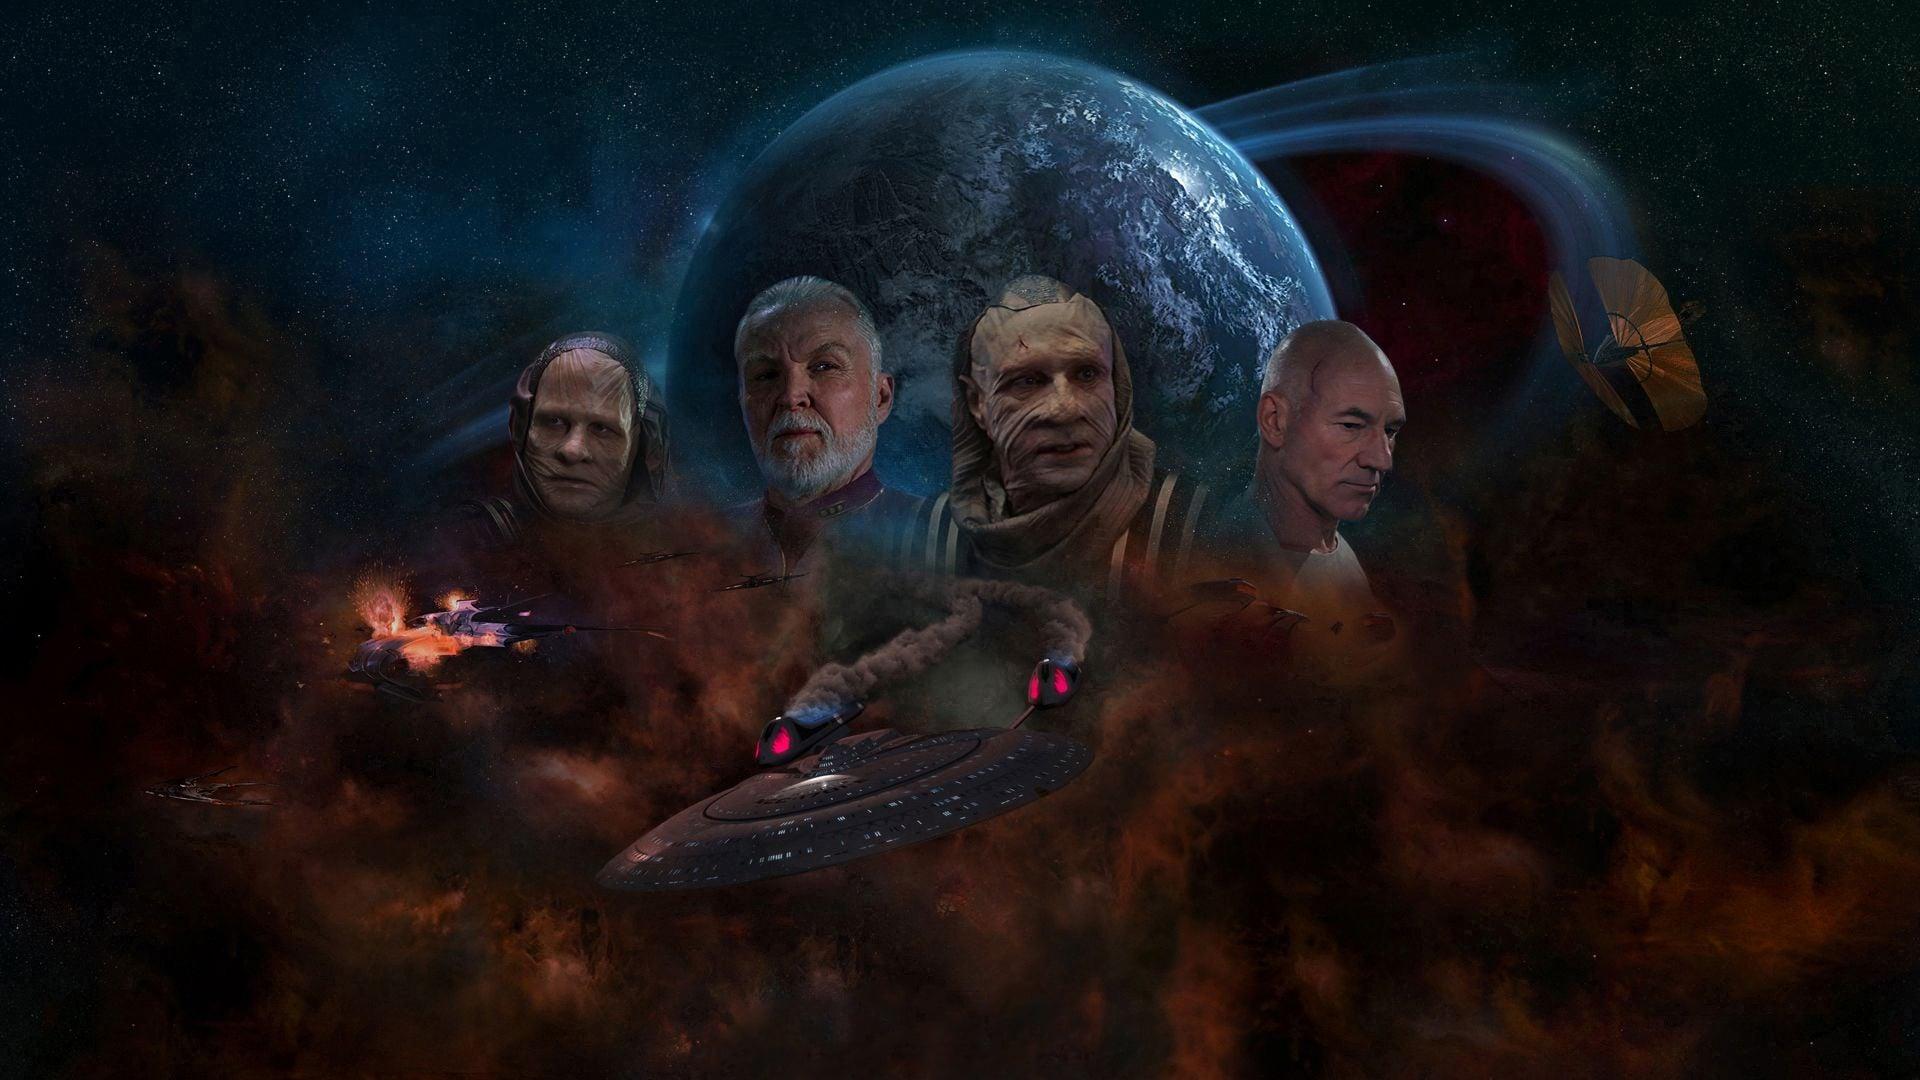 Regarder Star Trek : Insurrection en streaming gratuit